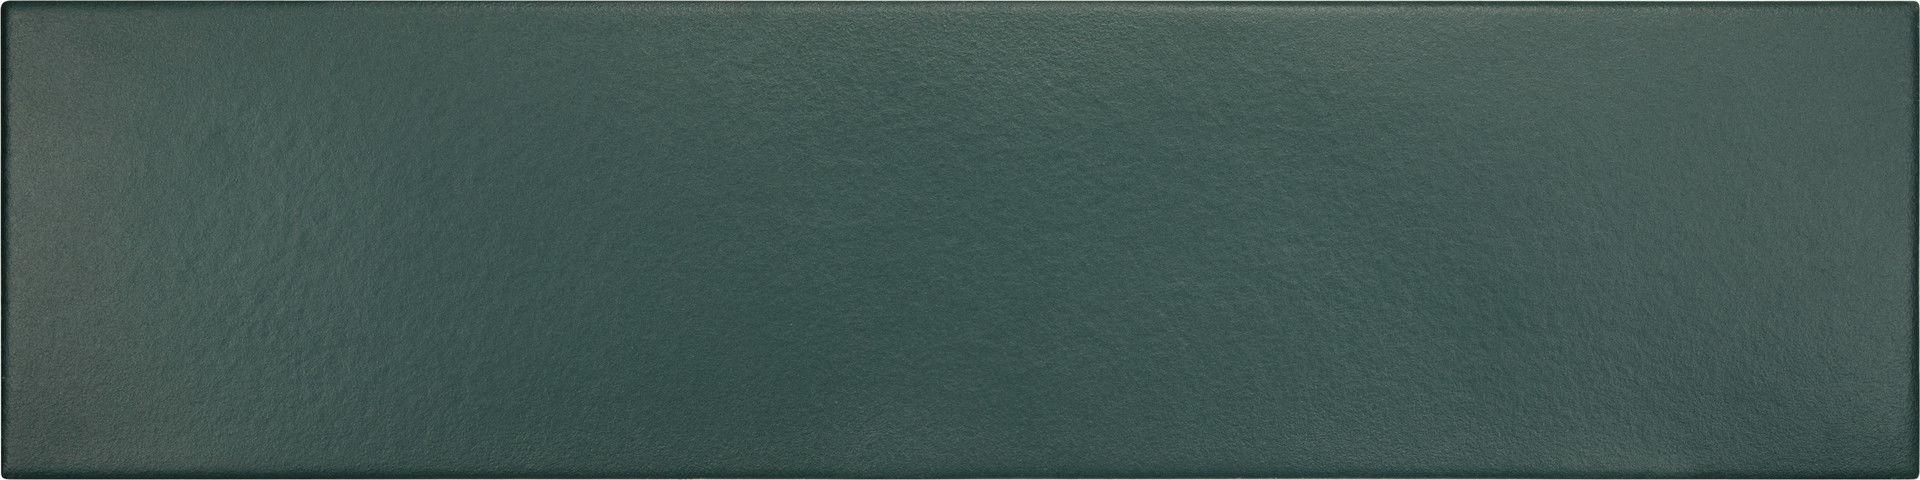 Stromboli Viridian Green 9.2X36.8 płytki jodełka